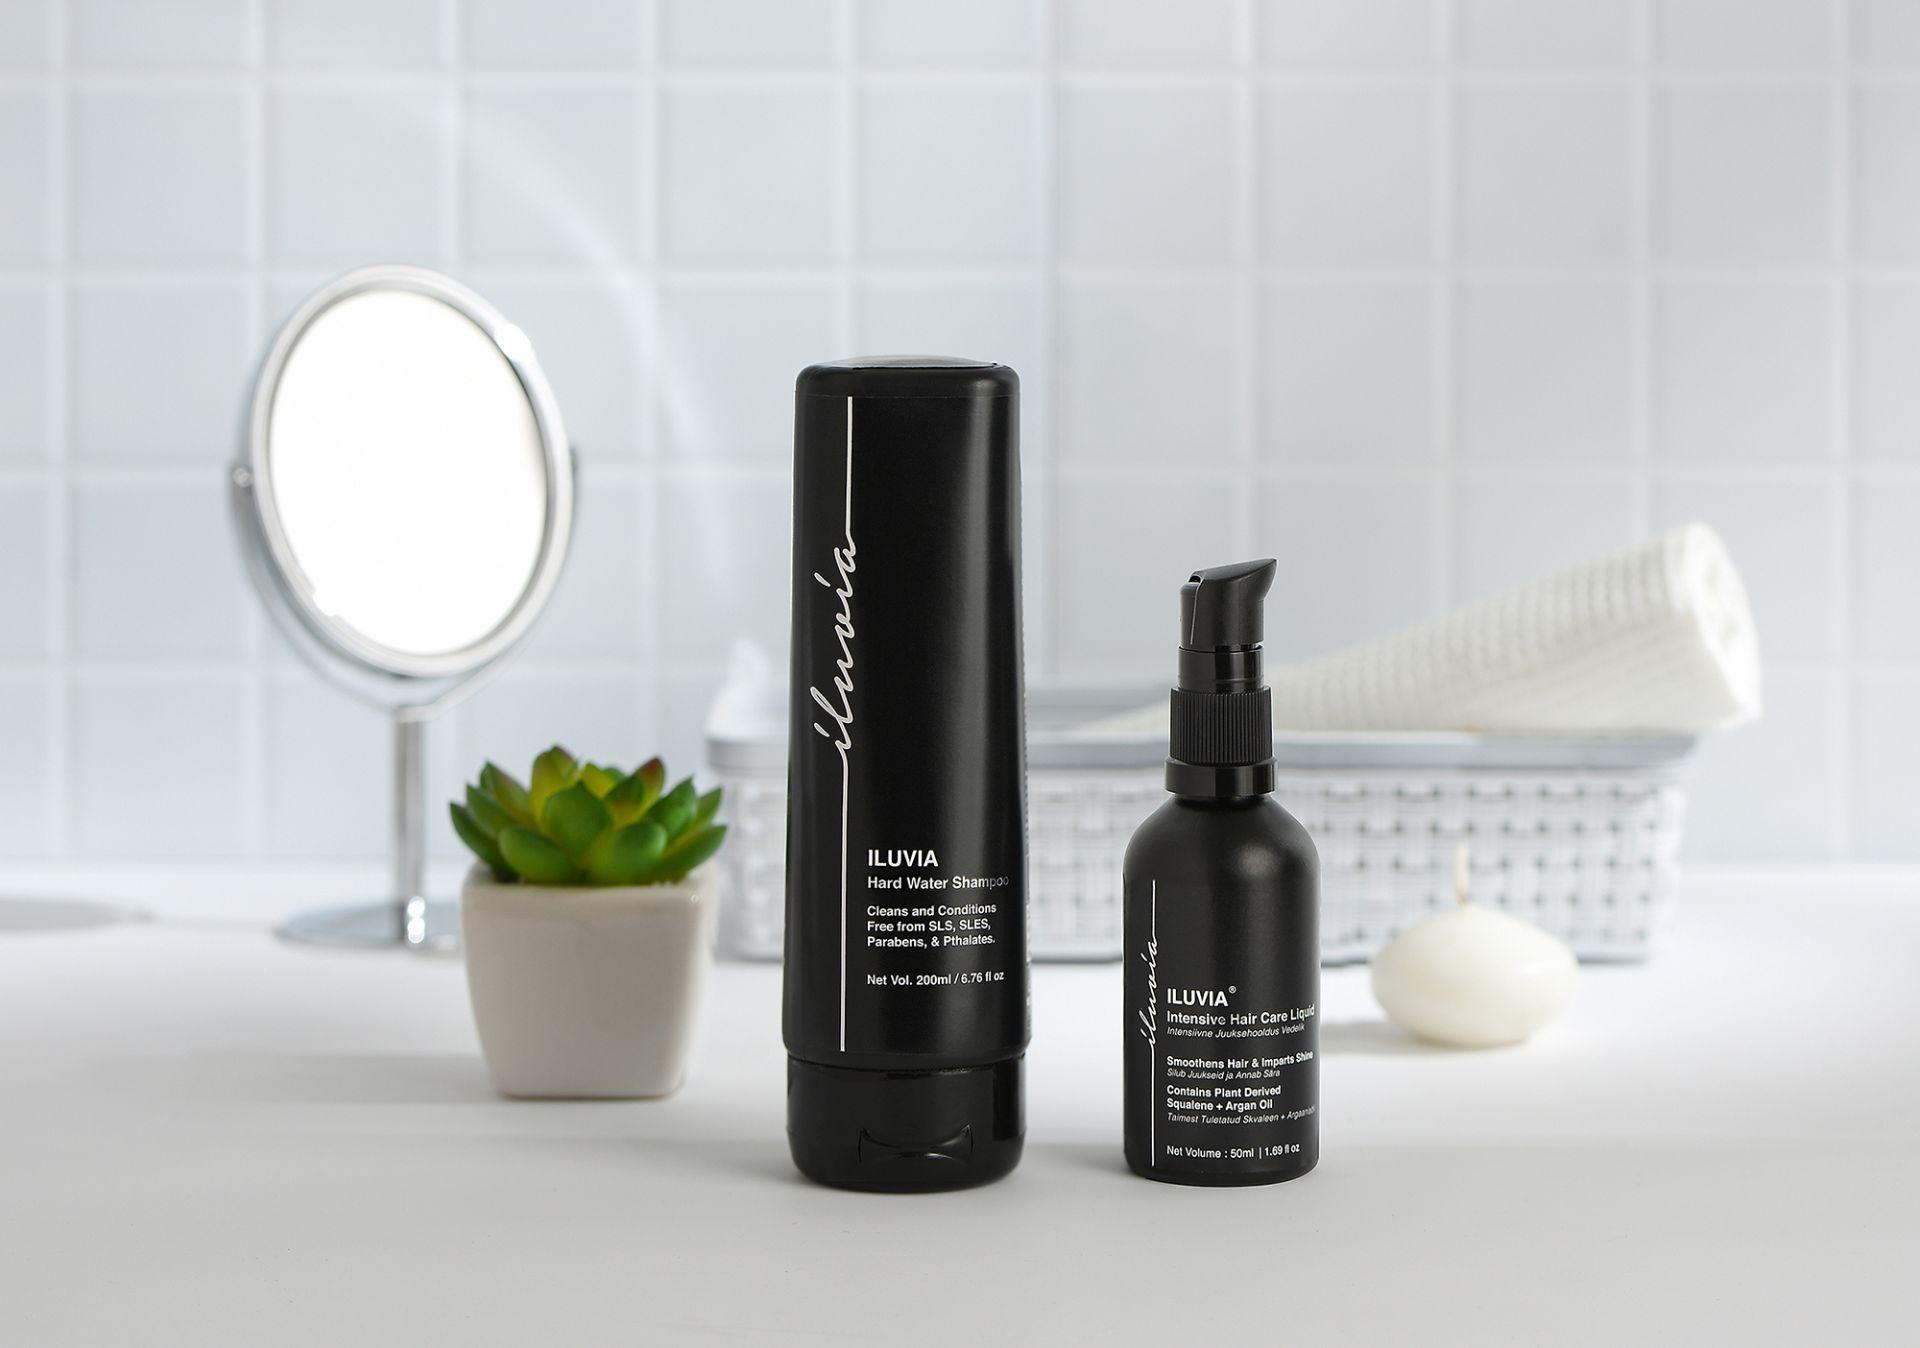 Product Photography Iluvia Haircare Sanket